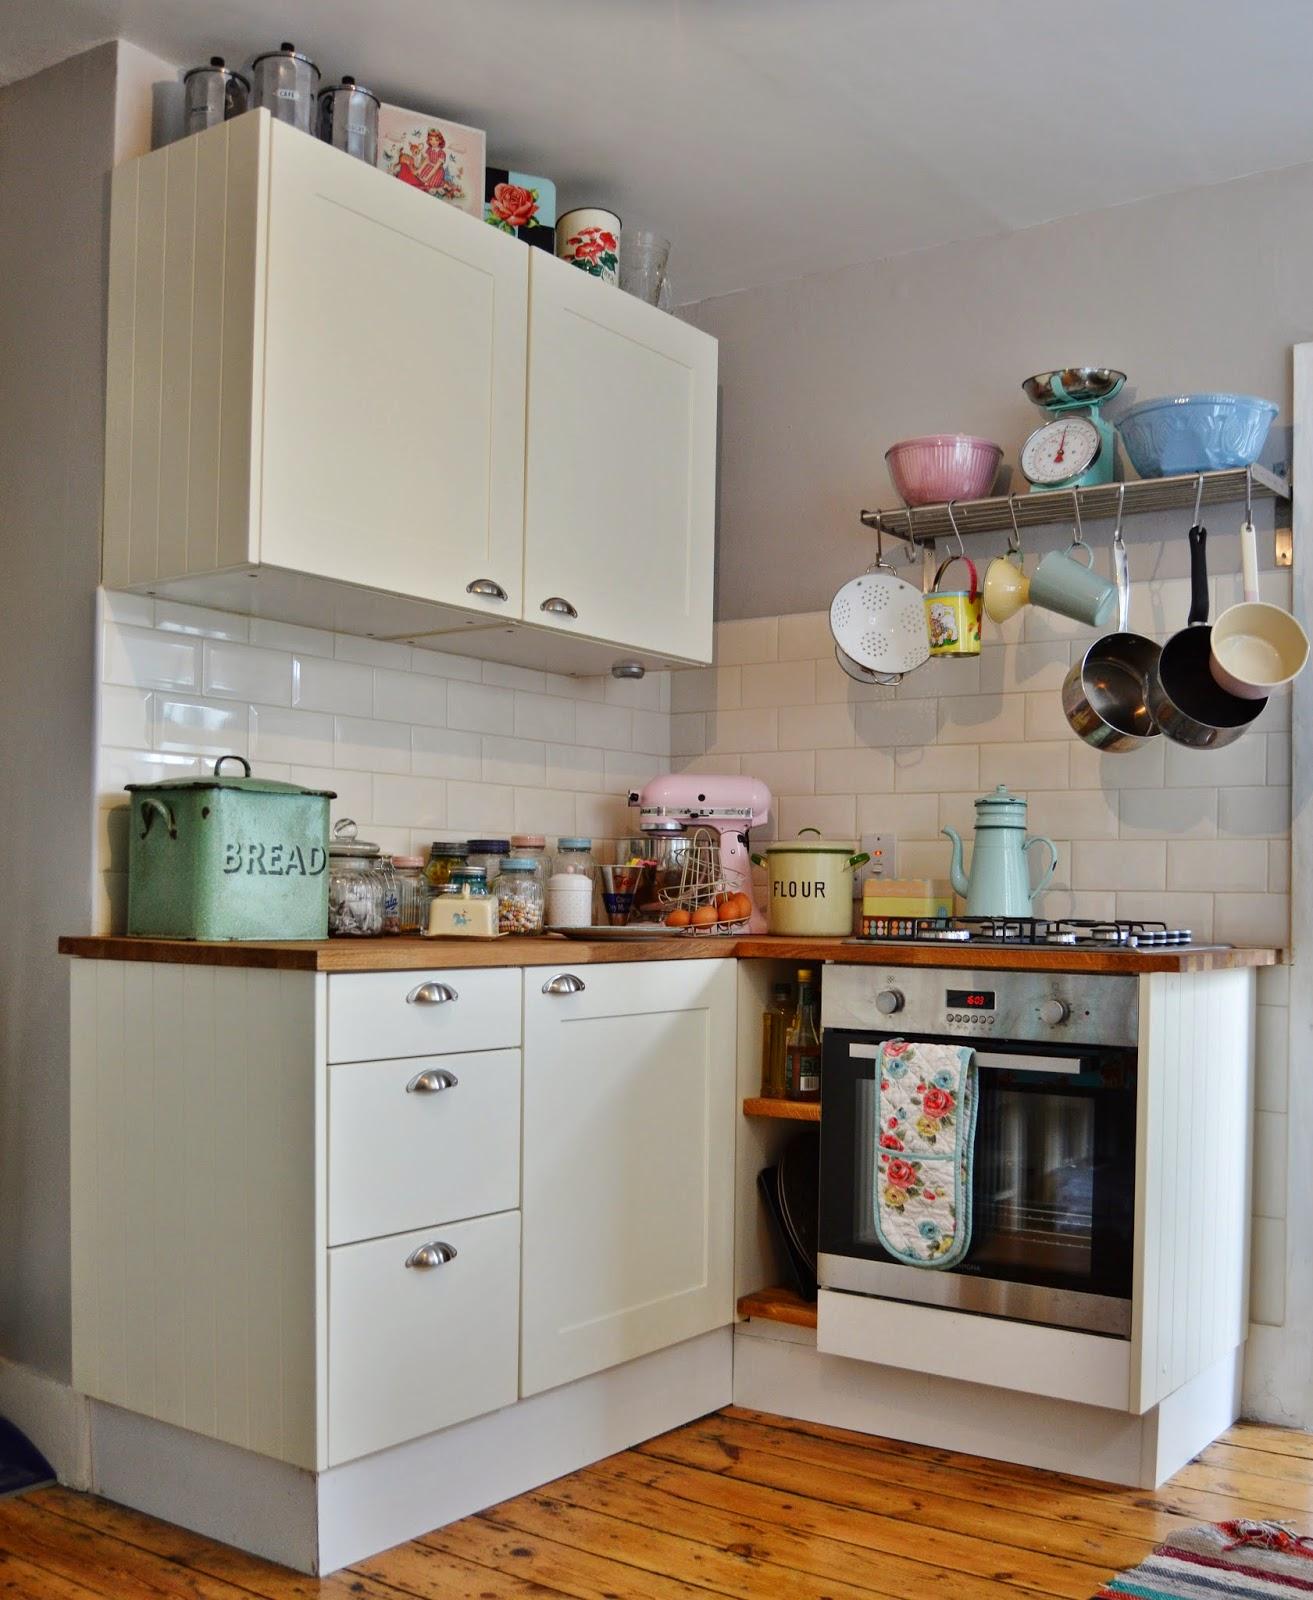 Betty lou's bakery: premiärvisning   vårt nya kök